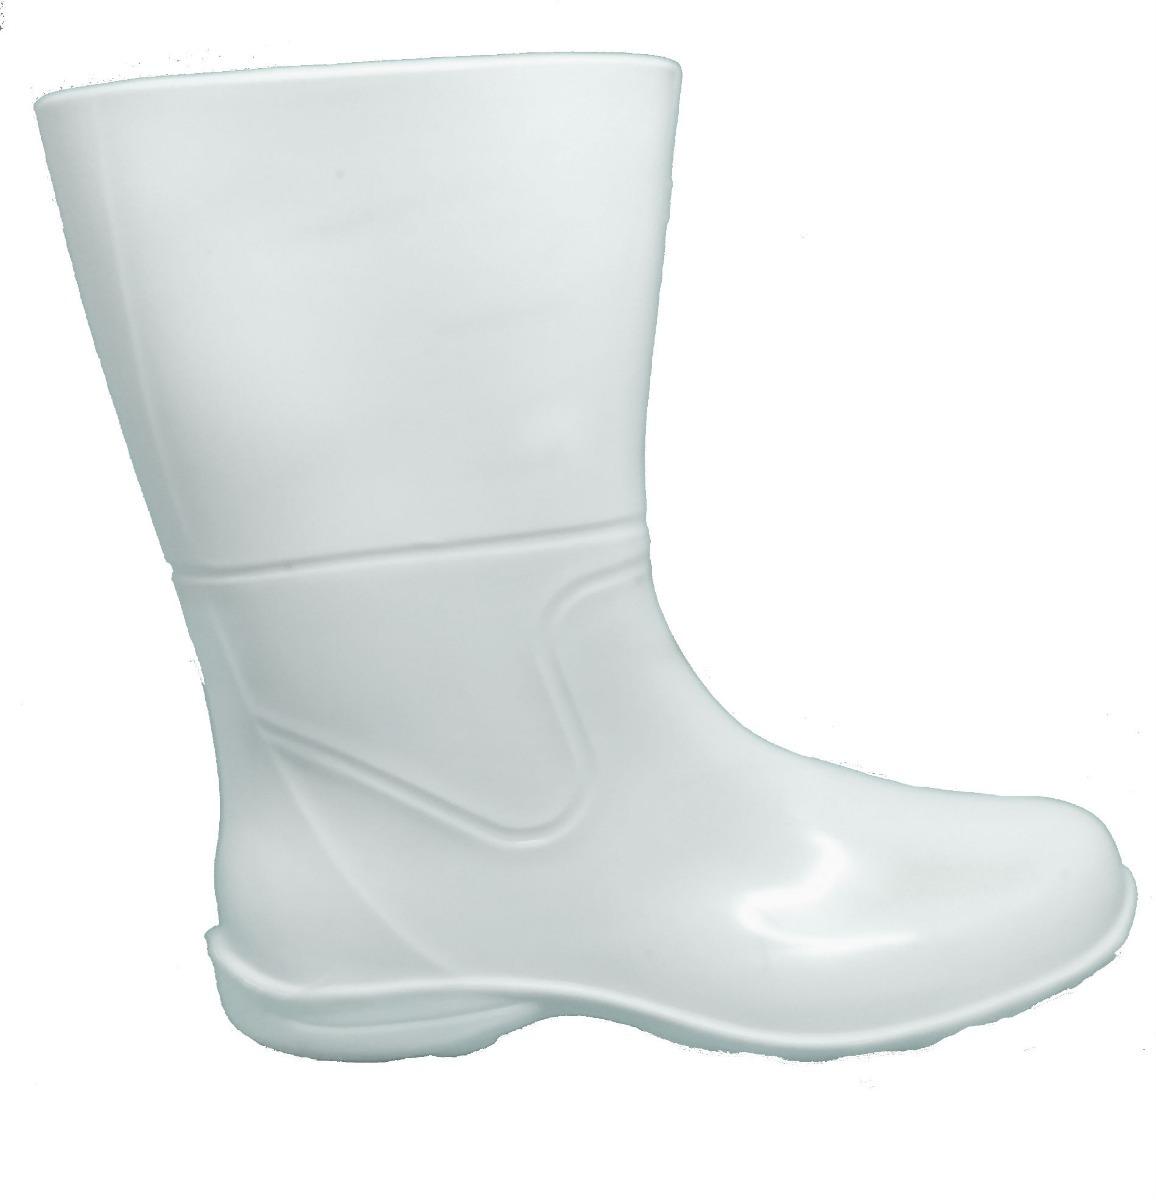 a368ff3b3e5 bota branca borracha galocha chuva feminina pat cano medio. Carregando zoom.